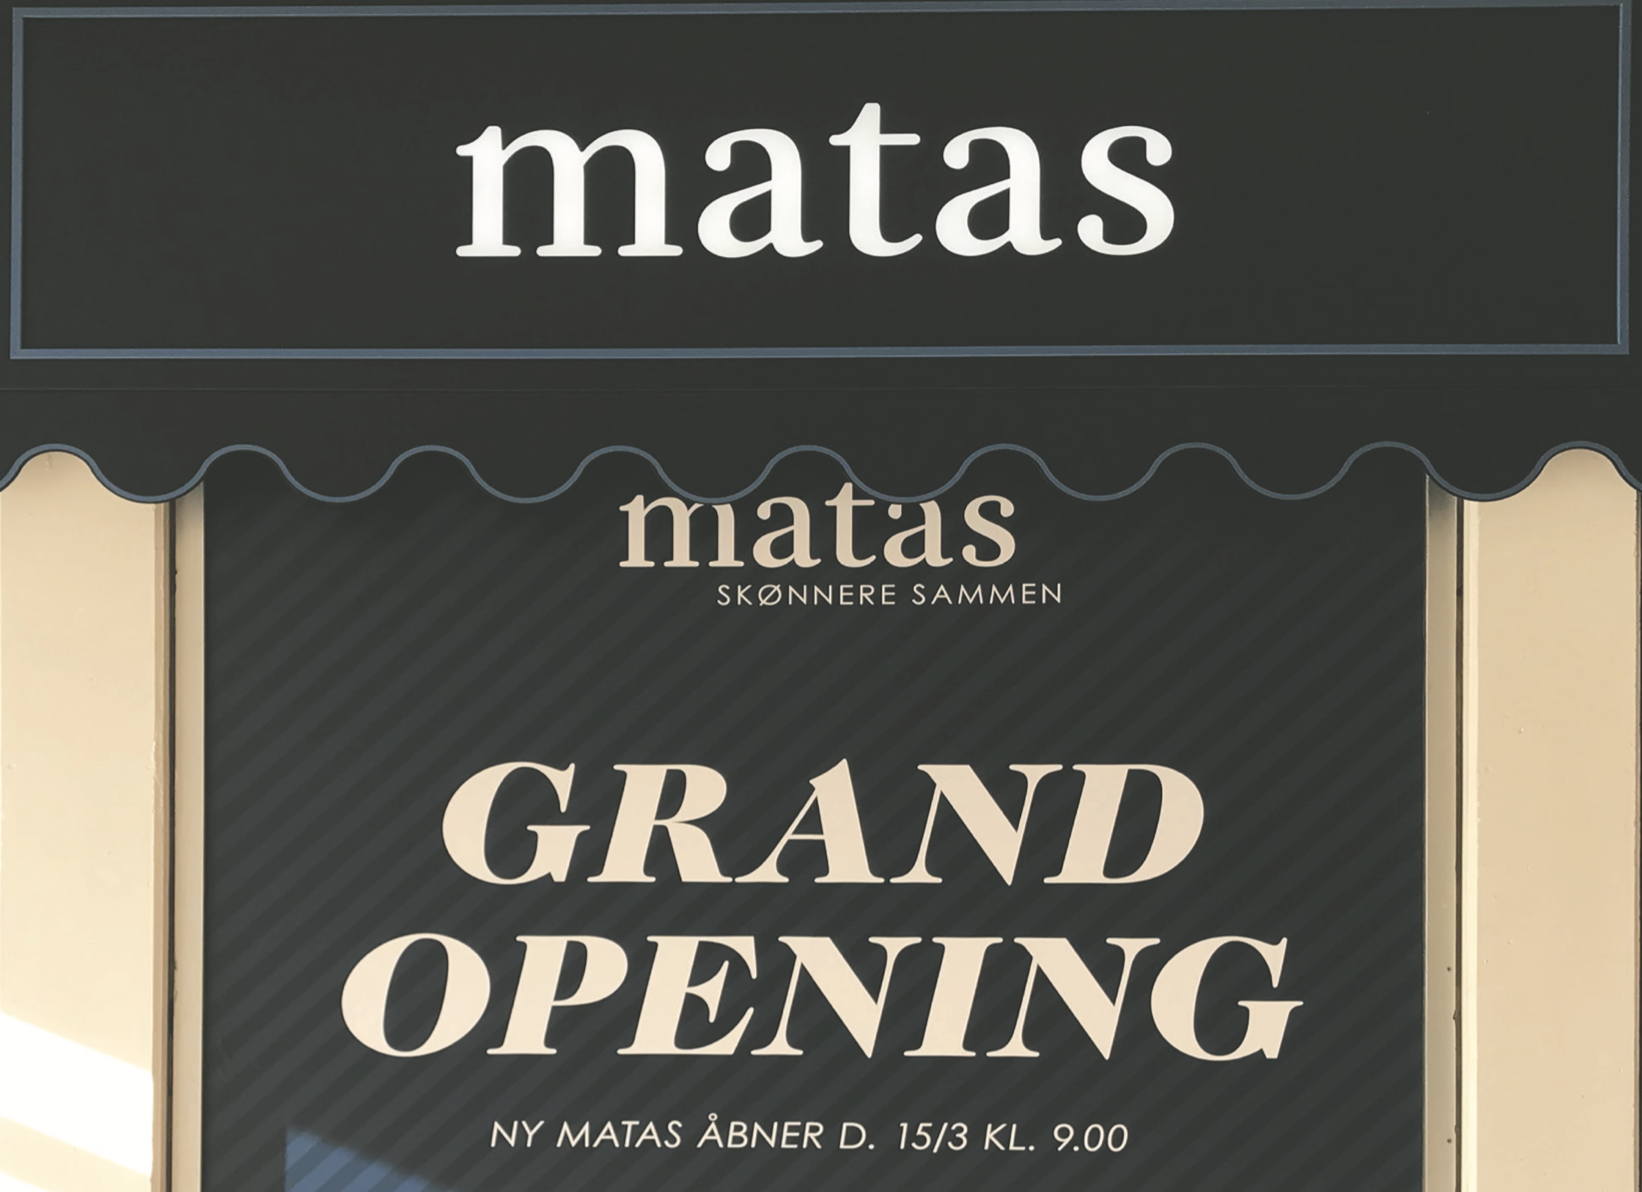 Grand Opening Matas Espergærde